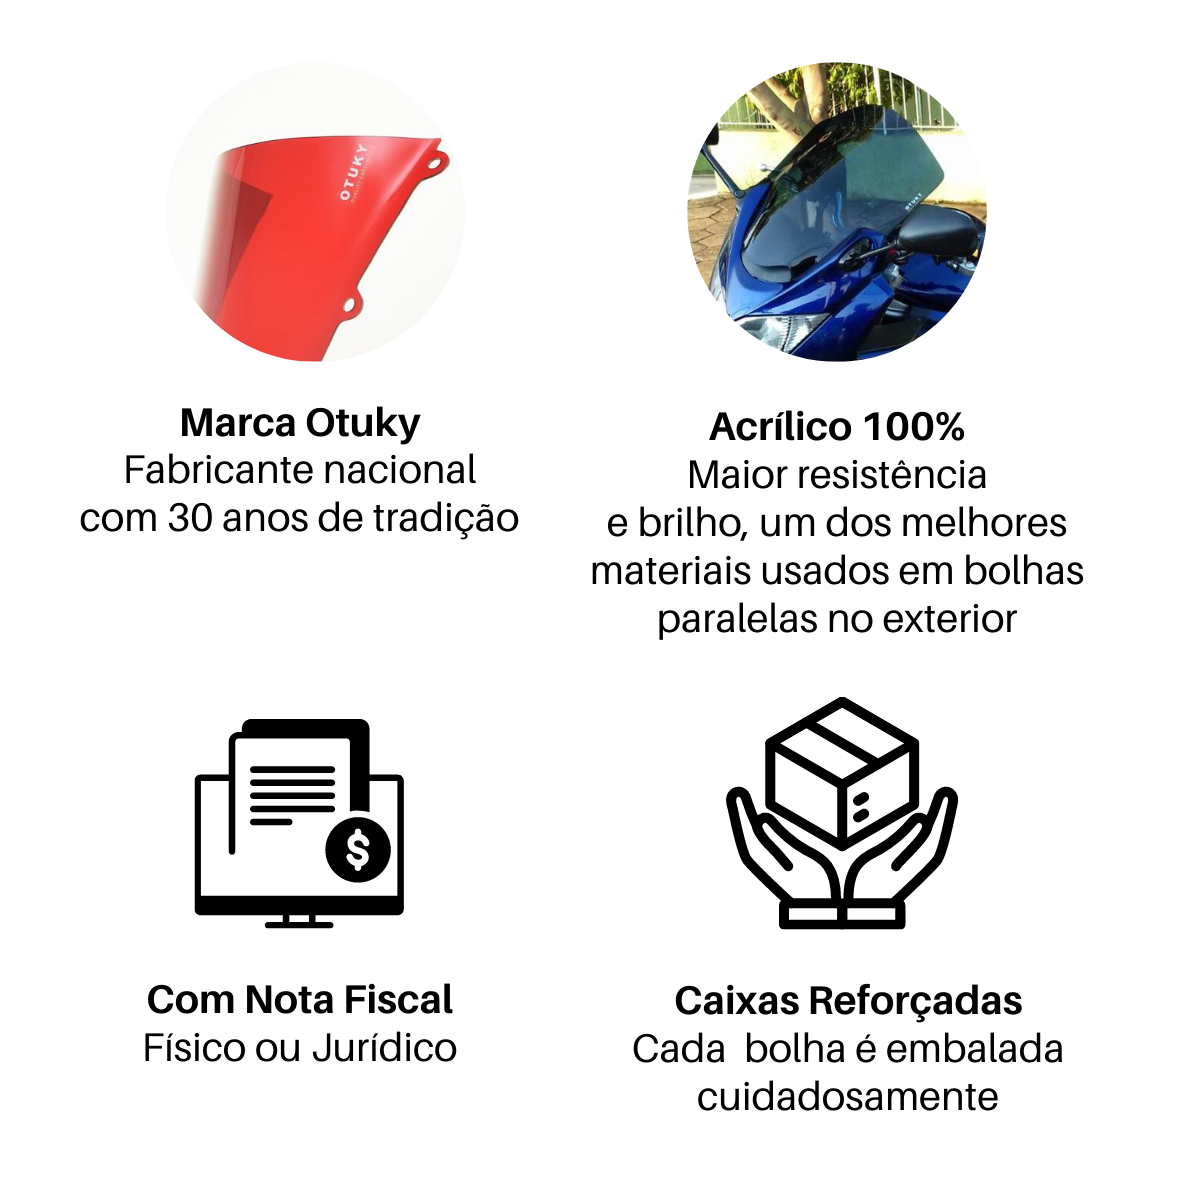 Bolha para Moto XT 660 R 2005 2006 2007 2008 2009 2010 2011 2012 2013 2014 2015 2016 2017 2018 Padrão Violeta Otuky